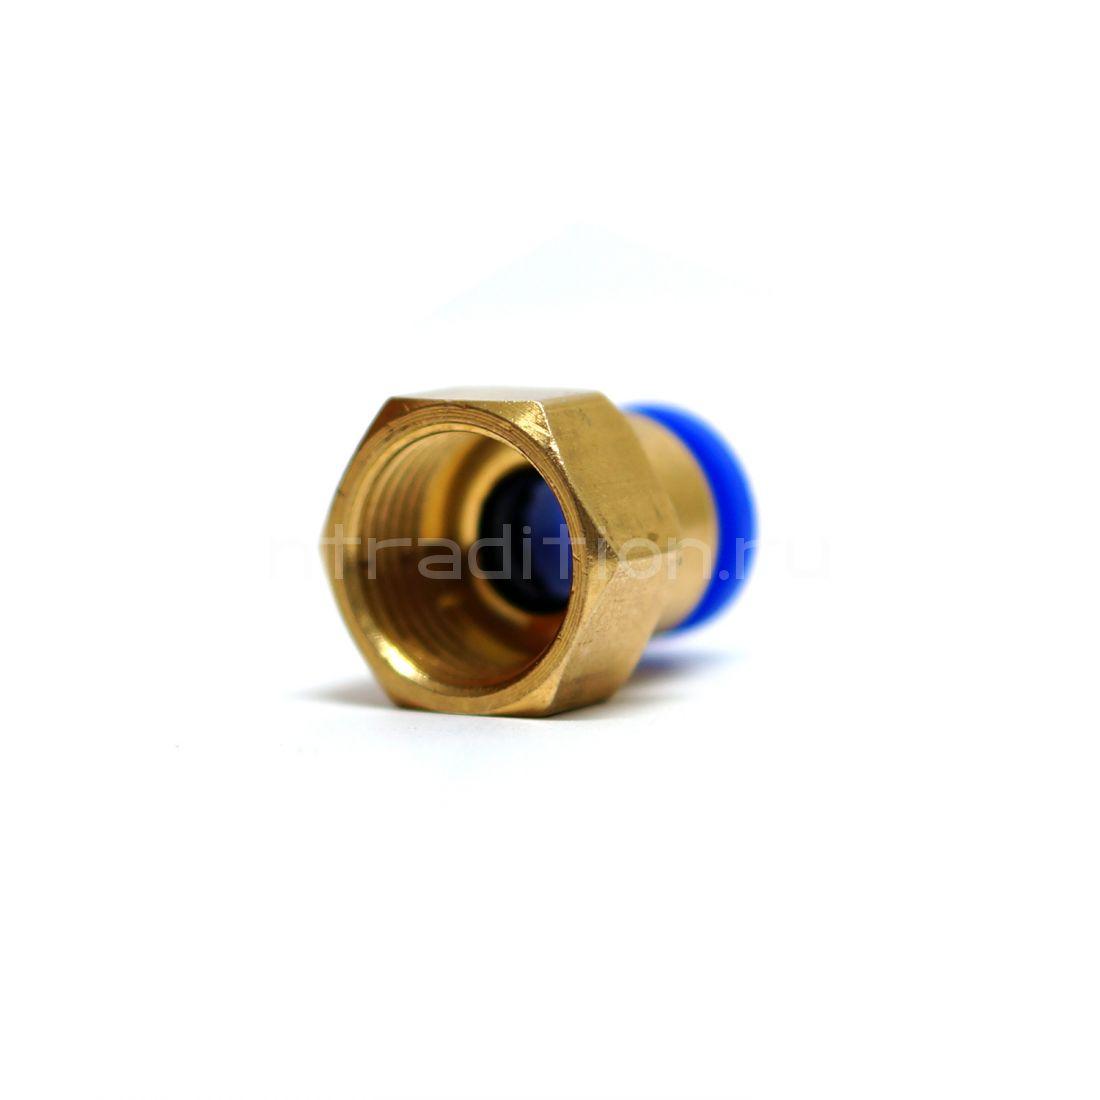 Штуцер-быстросъем 1/2 на 12 мм внутренняя резьба